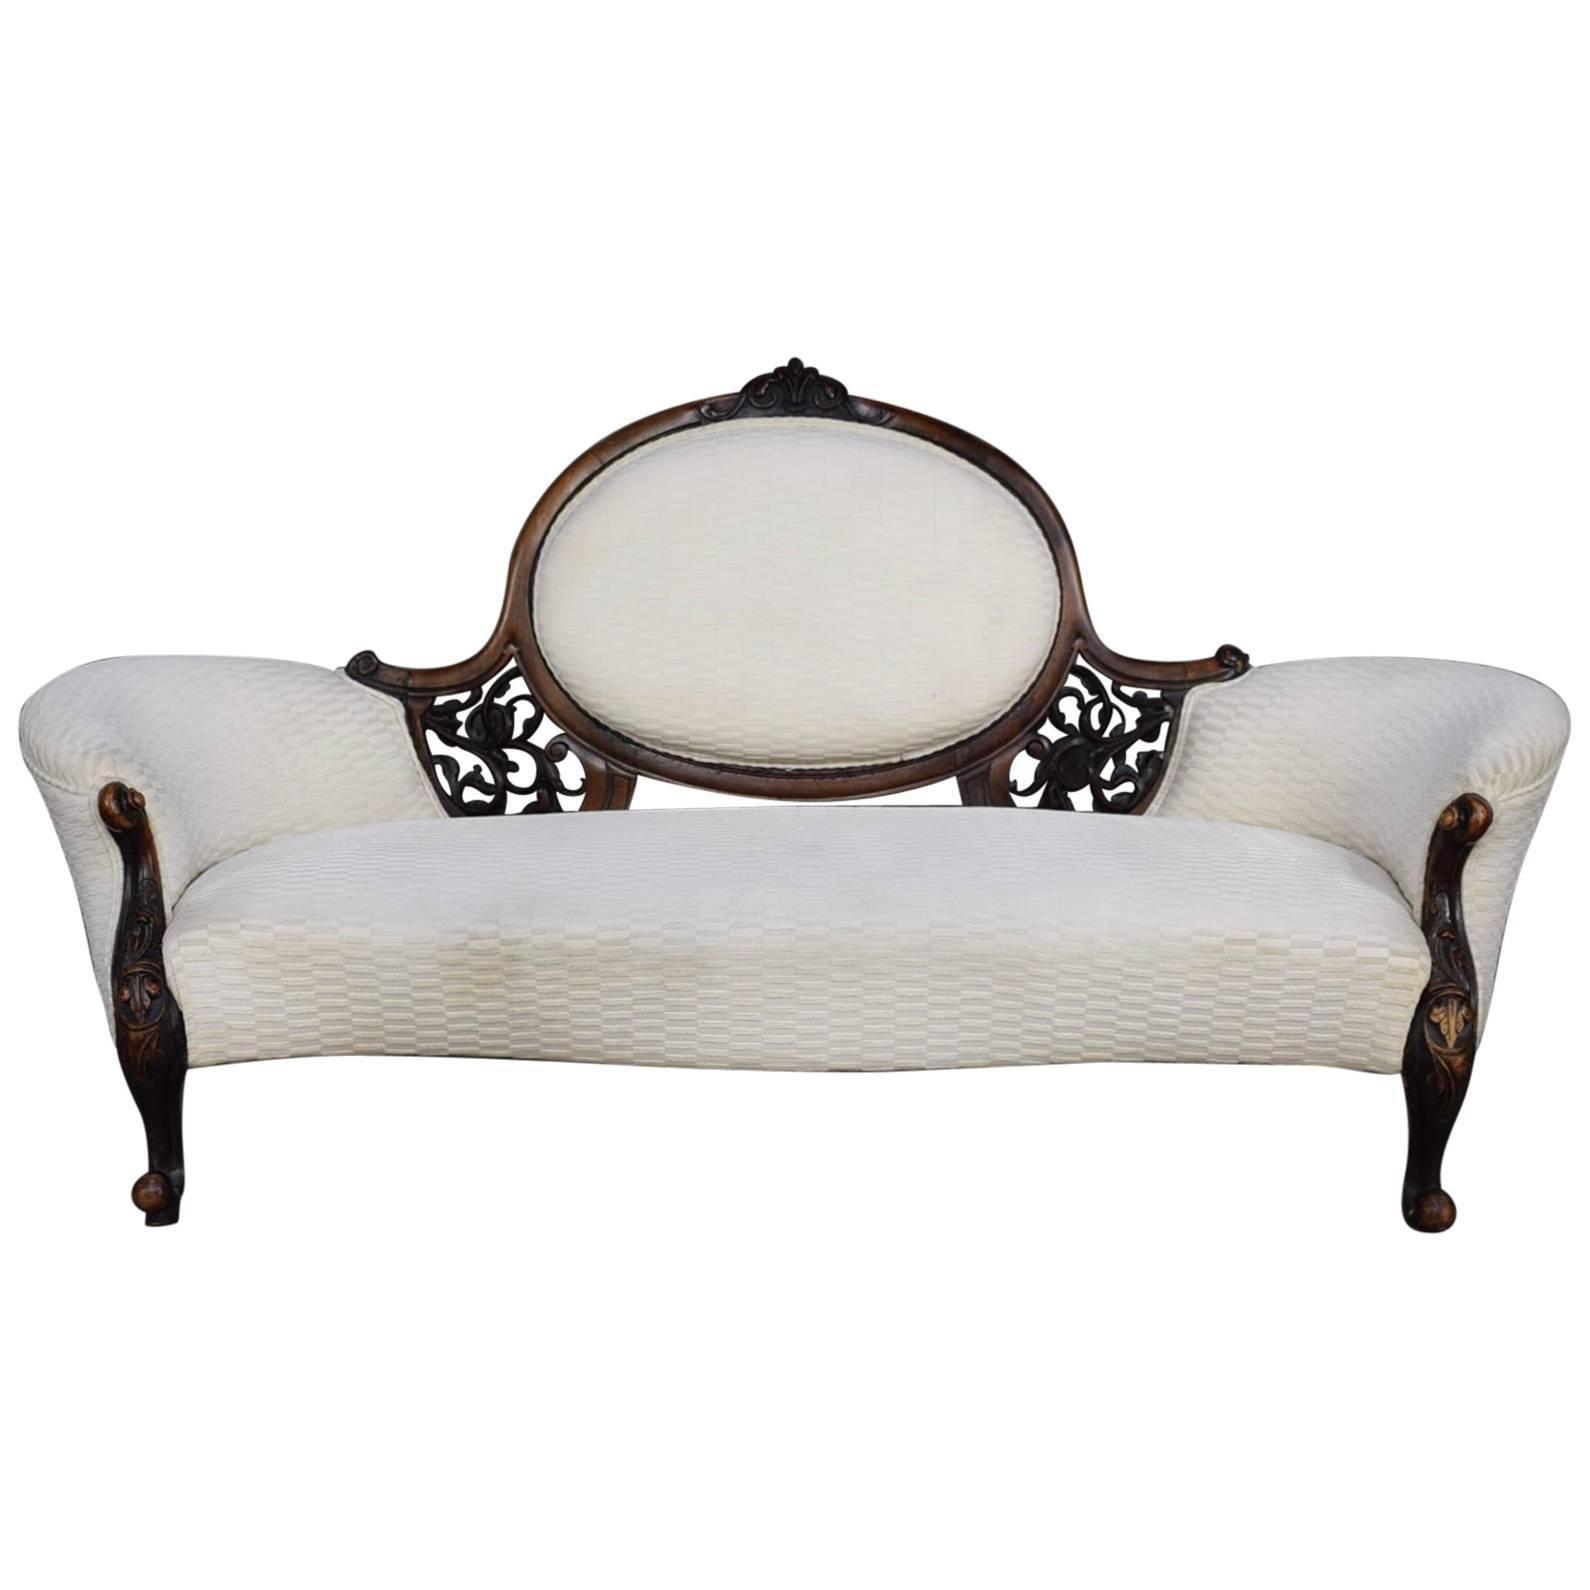 victorian antique chaise longue love seat sofa 18th 19th century rh 1stdibs com  antique chaise longue sofa bed